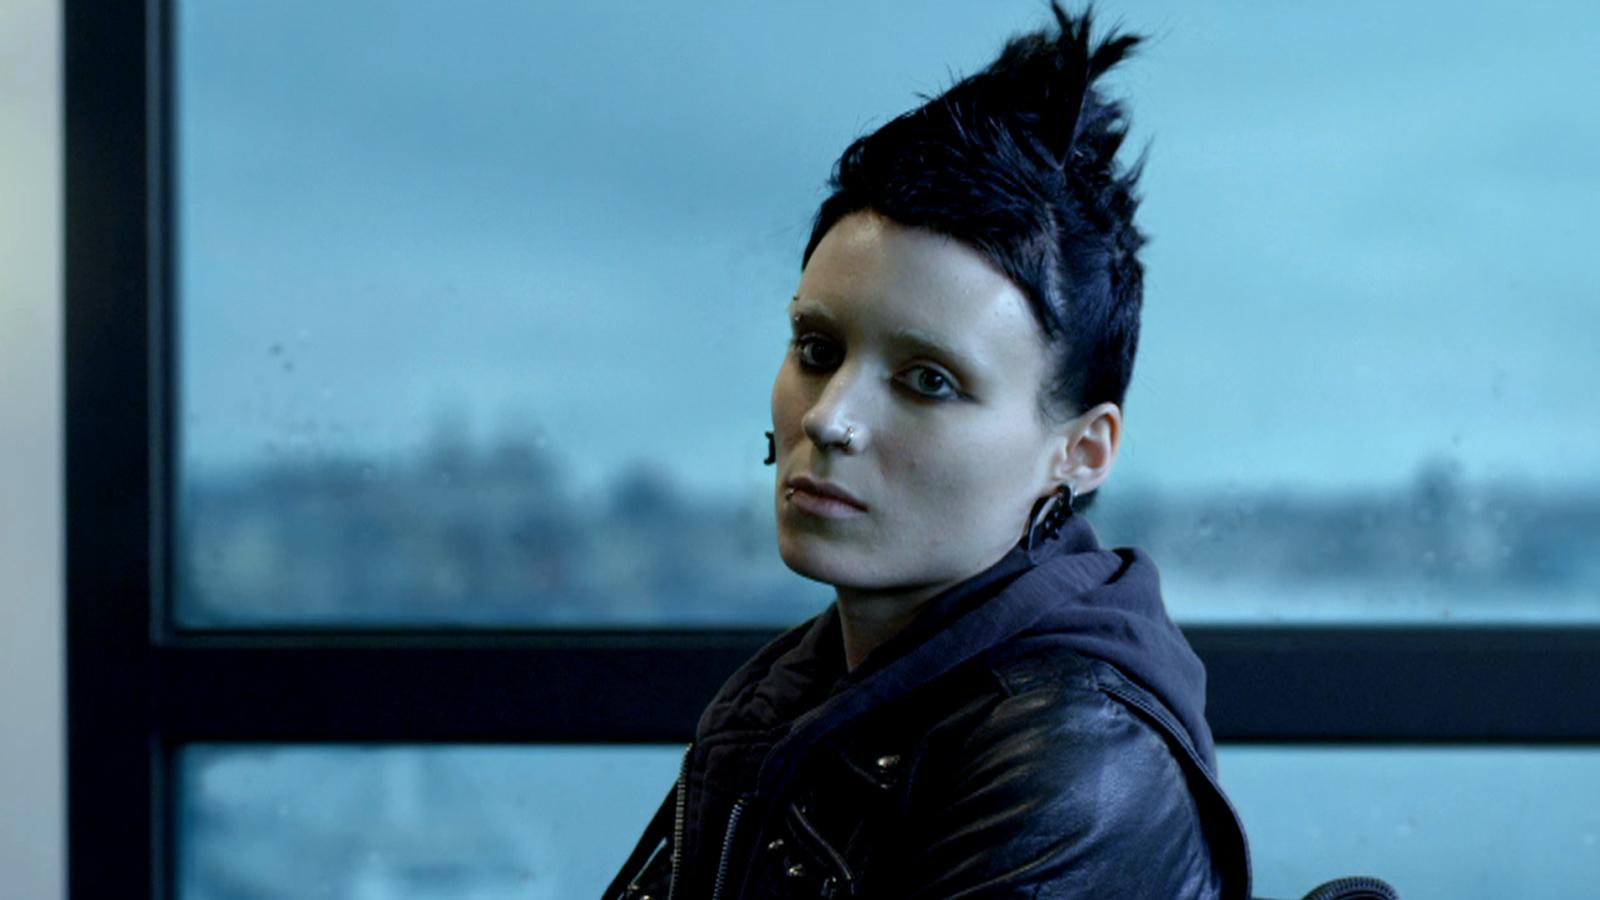 Beames on Film: In Defence of Rooney Mara's Sensitive Salander